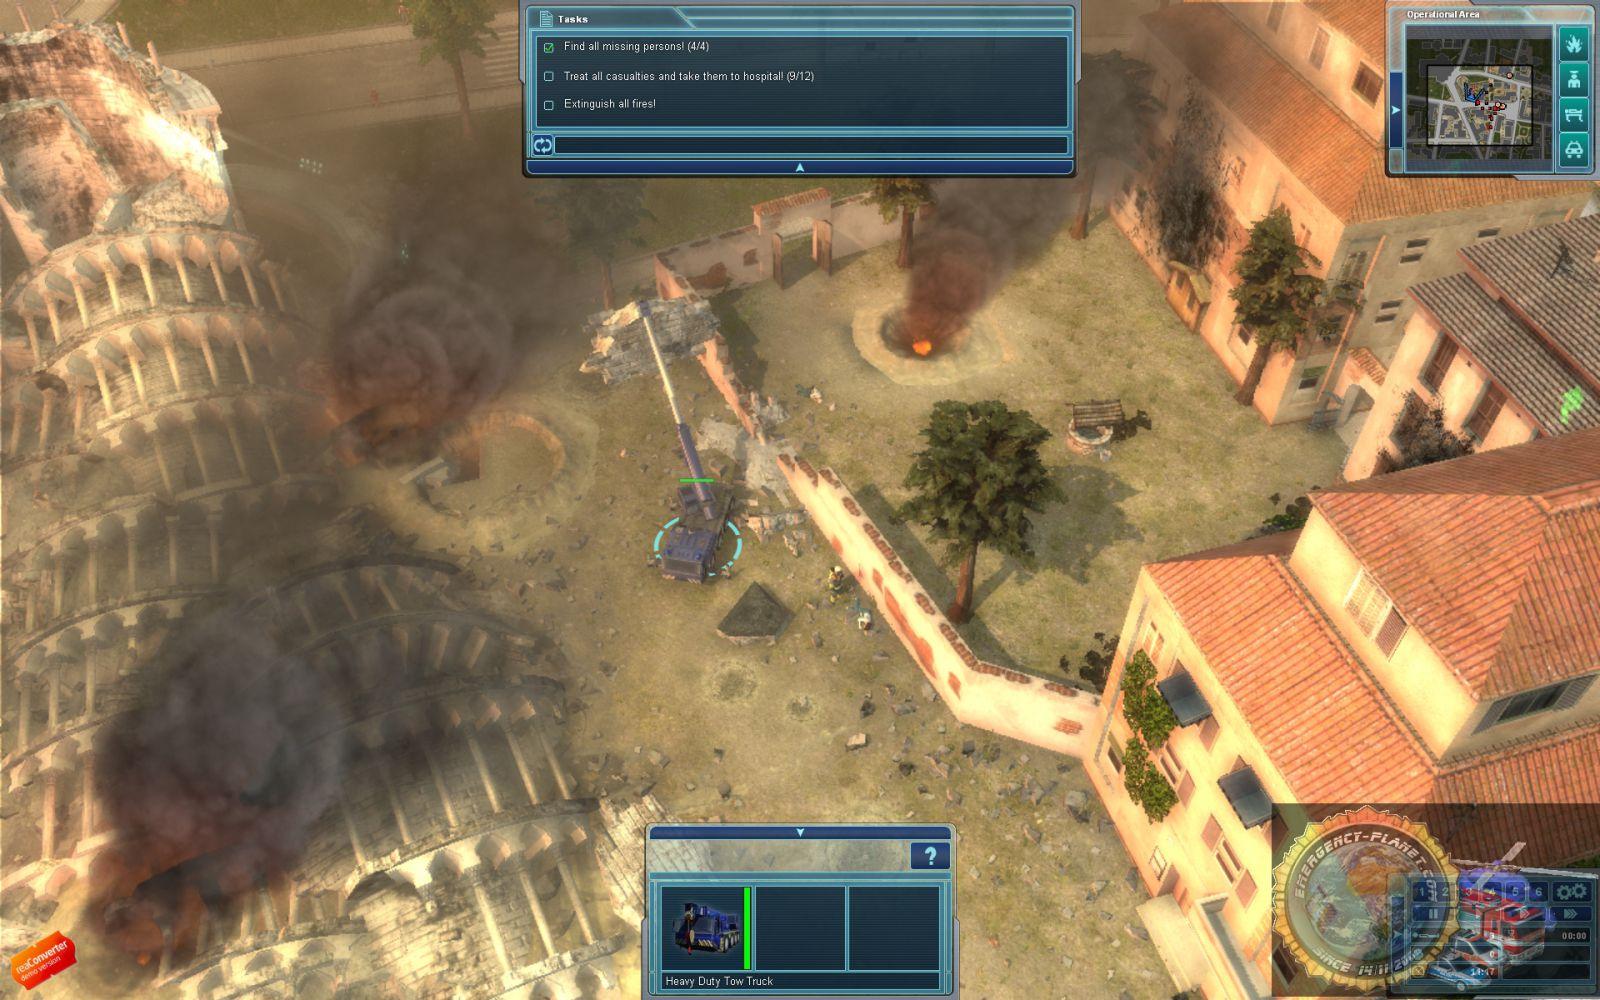 Emergency 2014 Screenshot 23